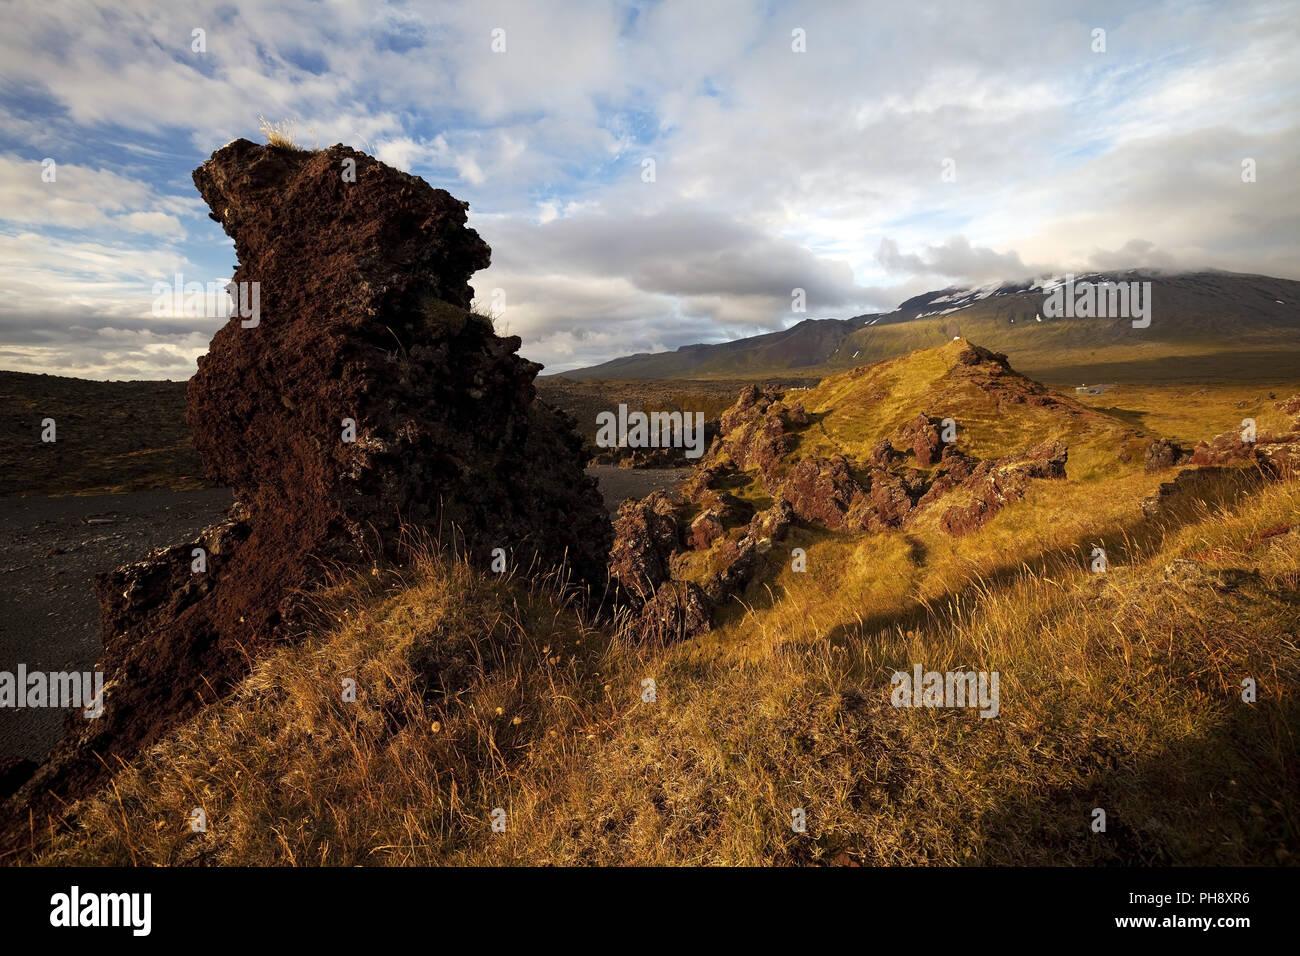 lava rock of Djupalonssandur, Snaefellsnes, Iceland - Stock Image